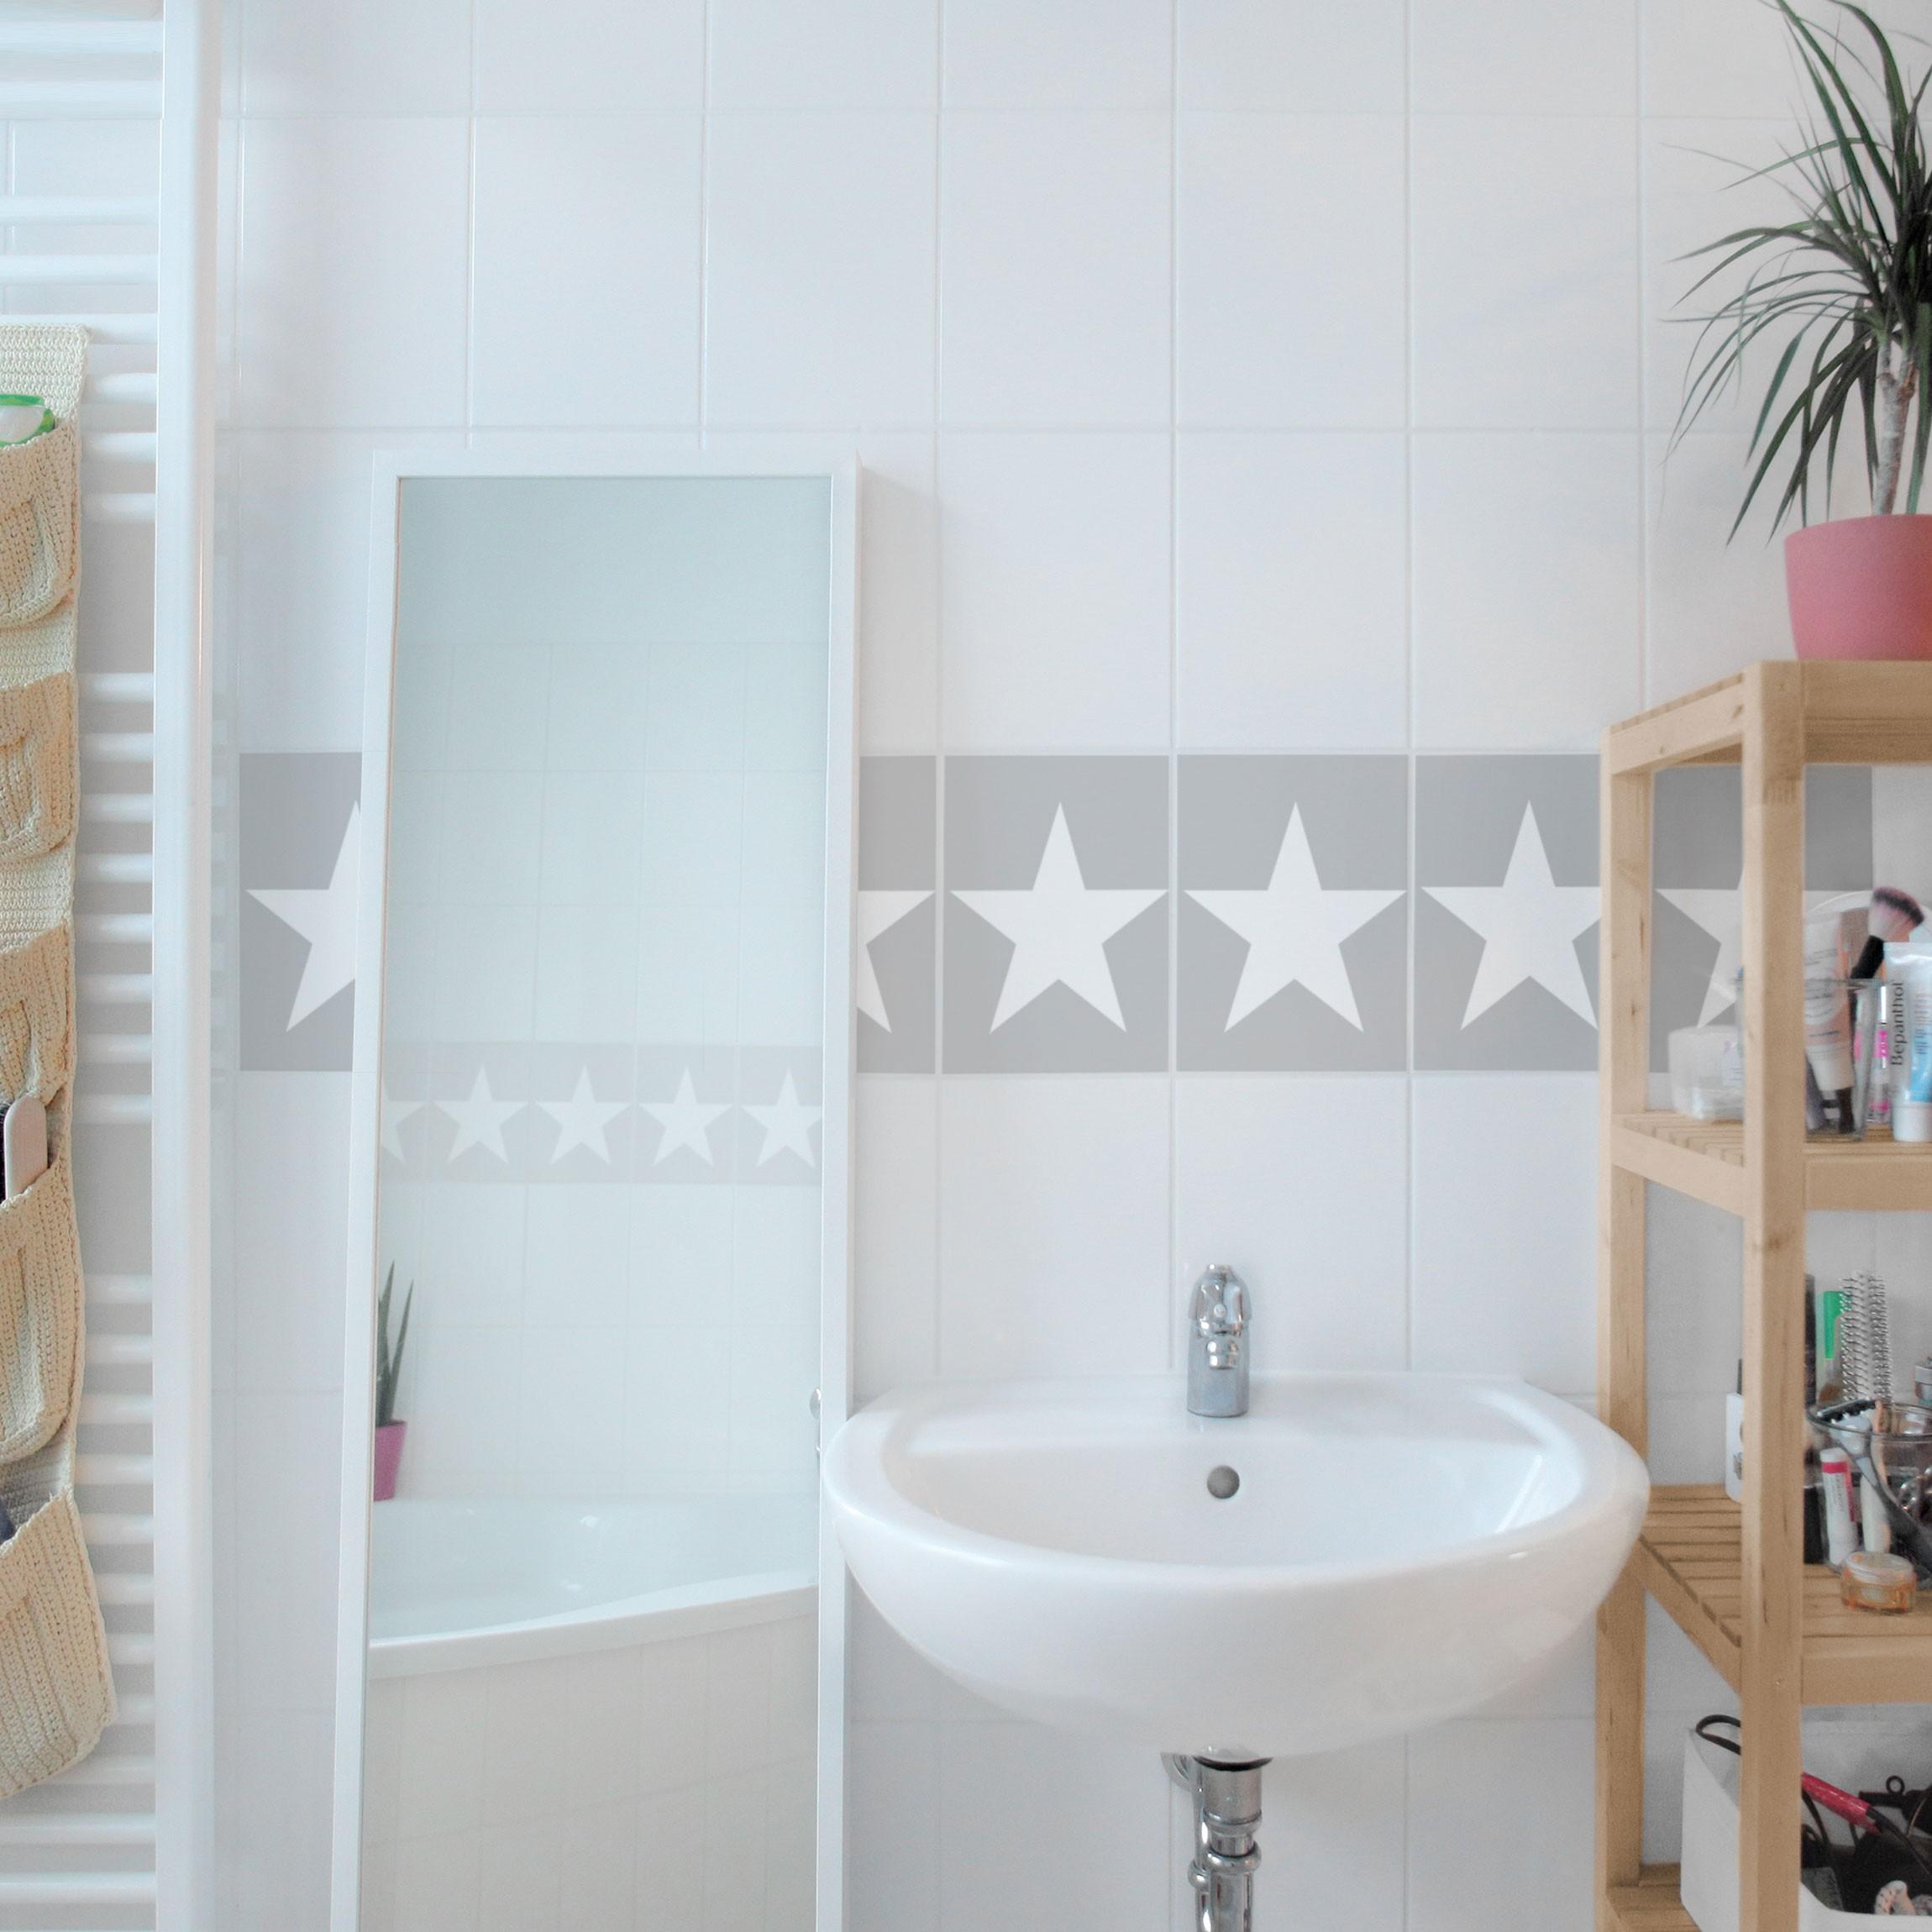 fliesen bord re gro e wei e sterne auf grau 20x15 cm fliesenaufkleber grau. Black Bedroom Furniture Sets. Home Design Ideas